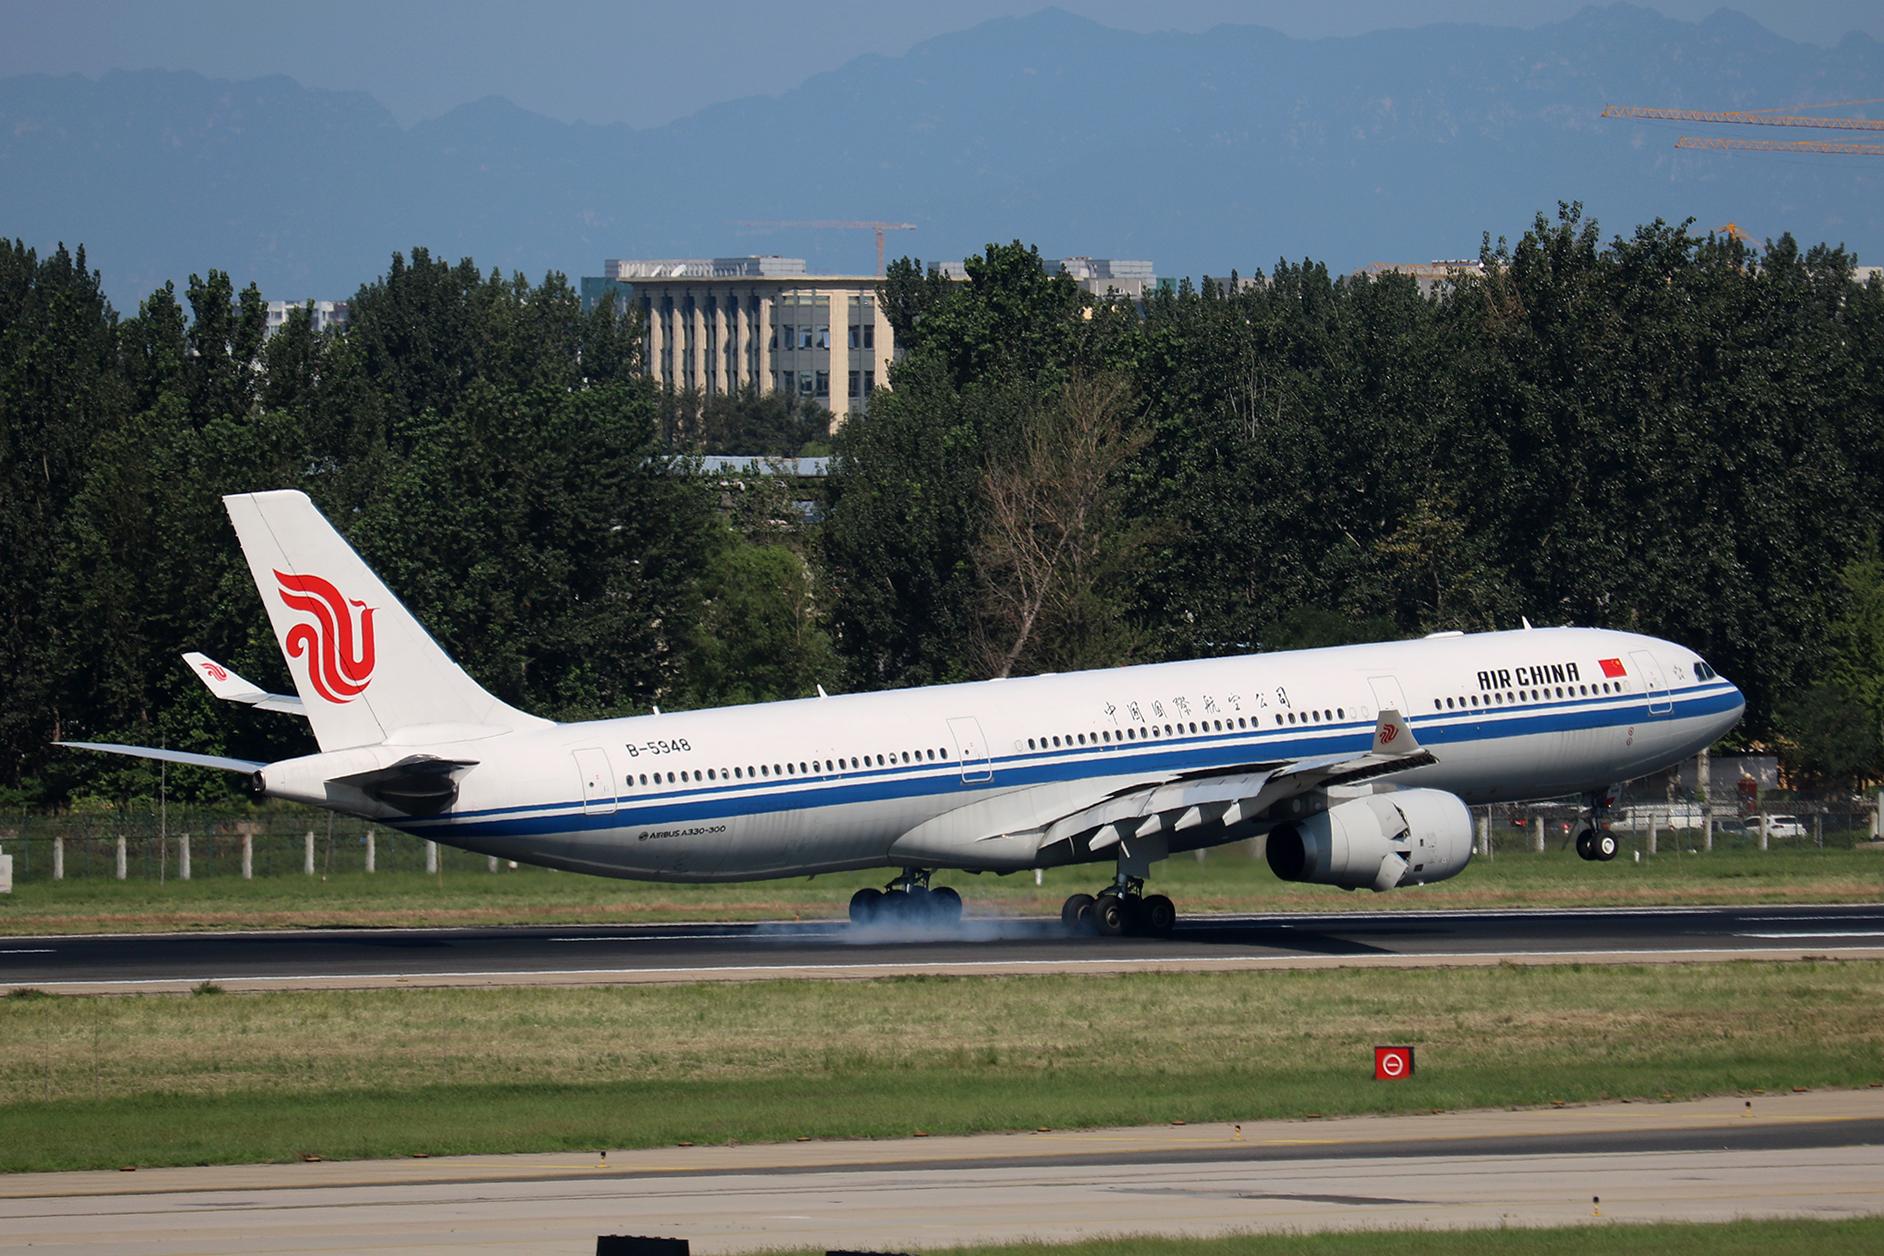 Re:[原创]LIULIU|【PEK】36L降落一组Ⅳ|擦烟 AIRBUS A330-300 B-5948 中国北京首都国际机场